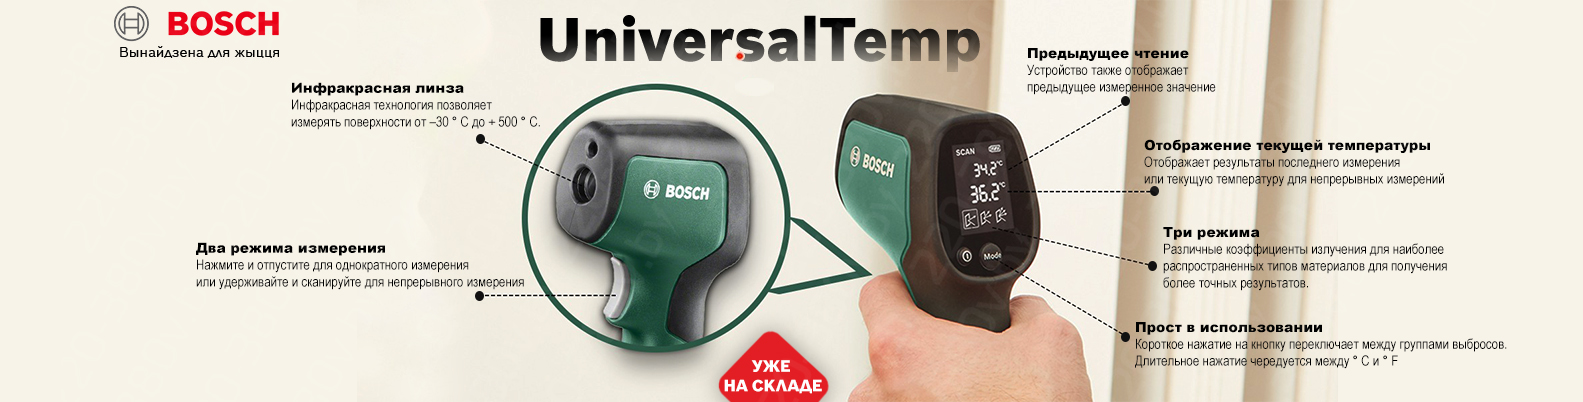 temp_universal